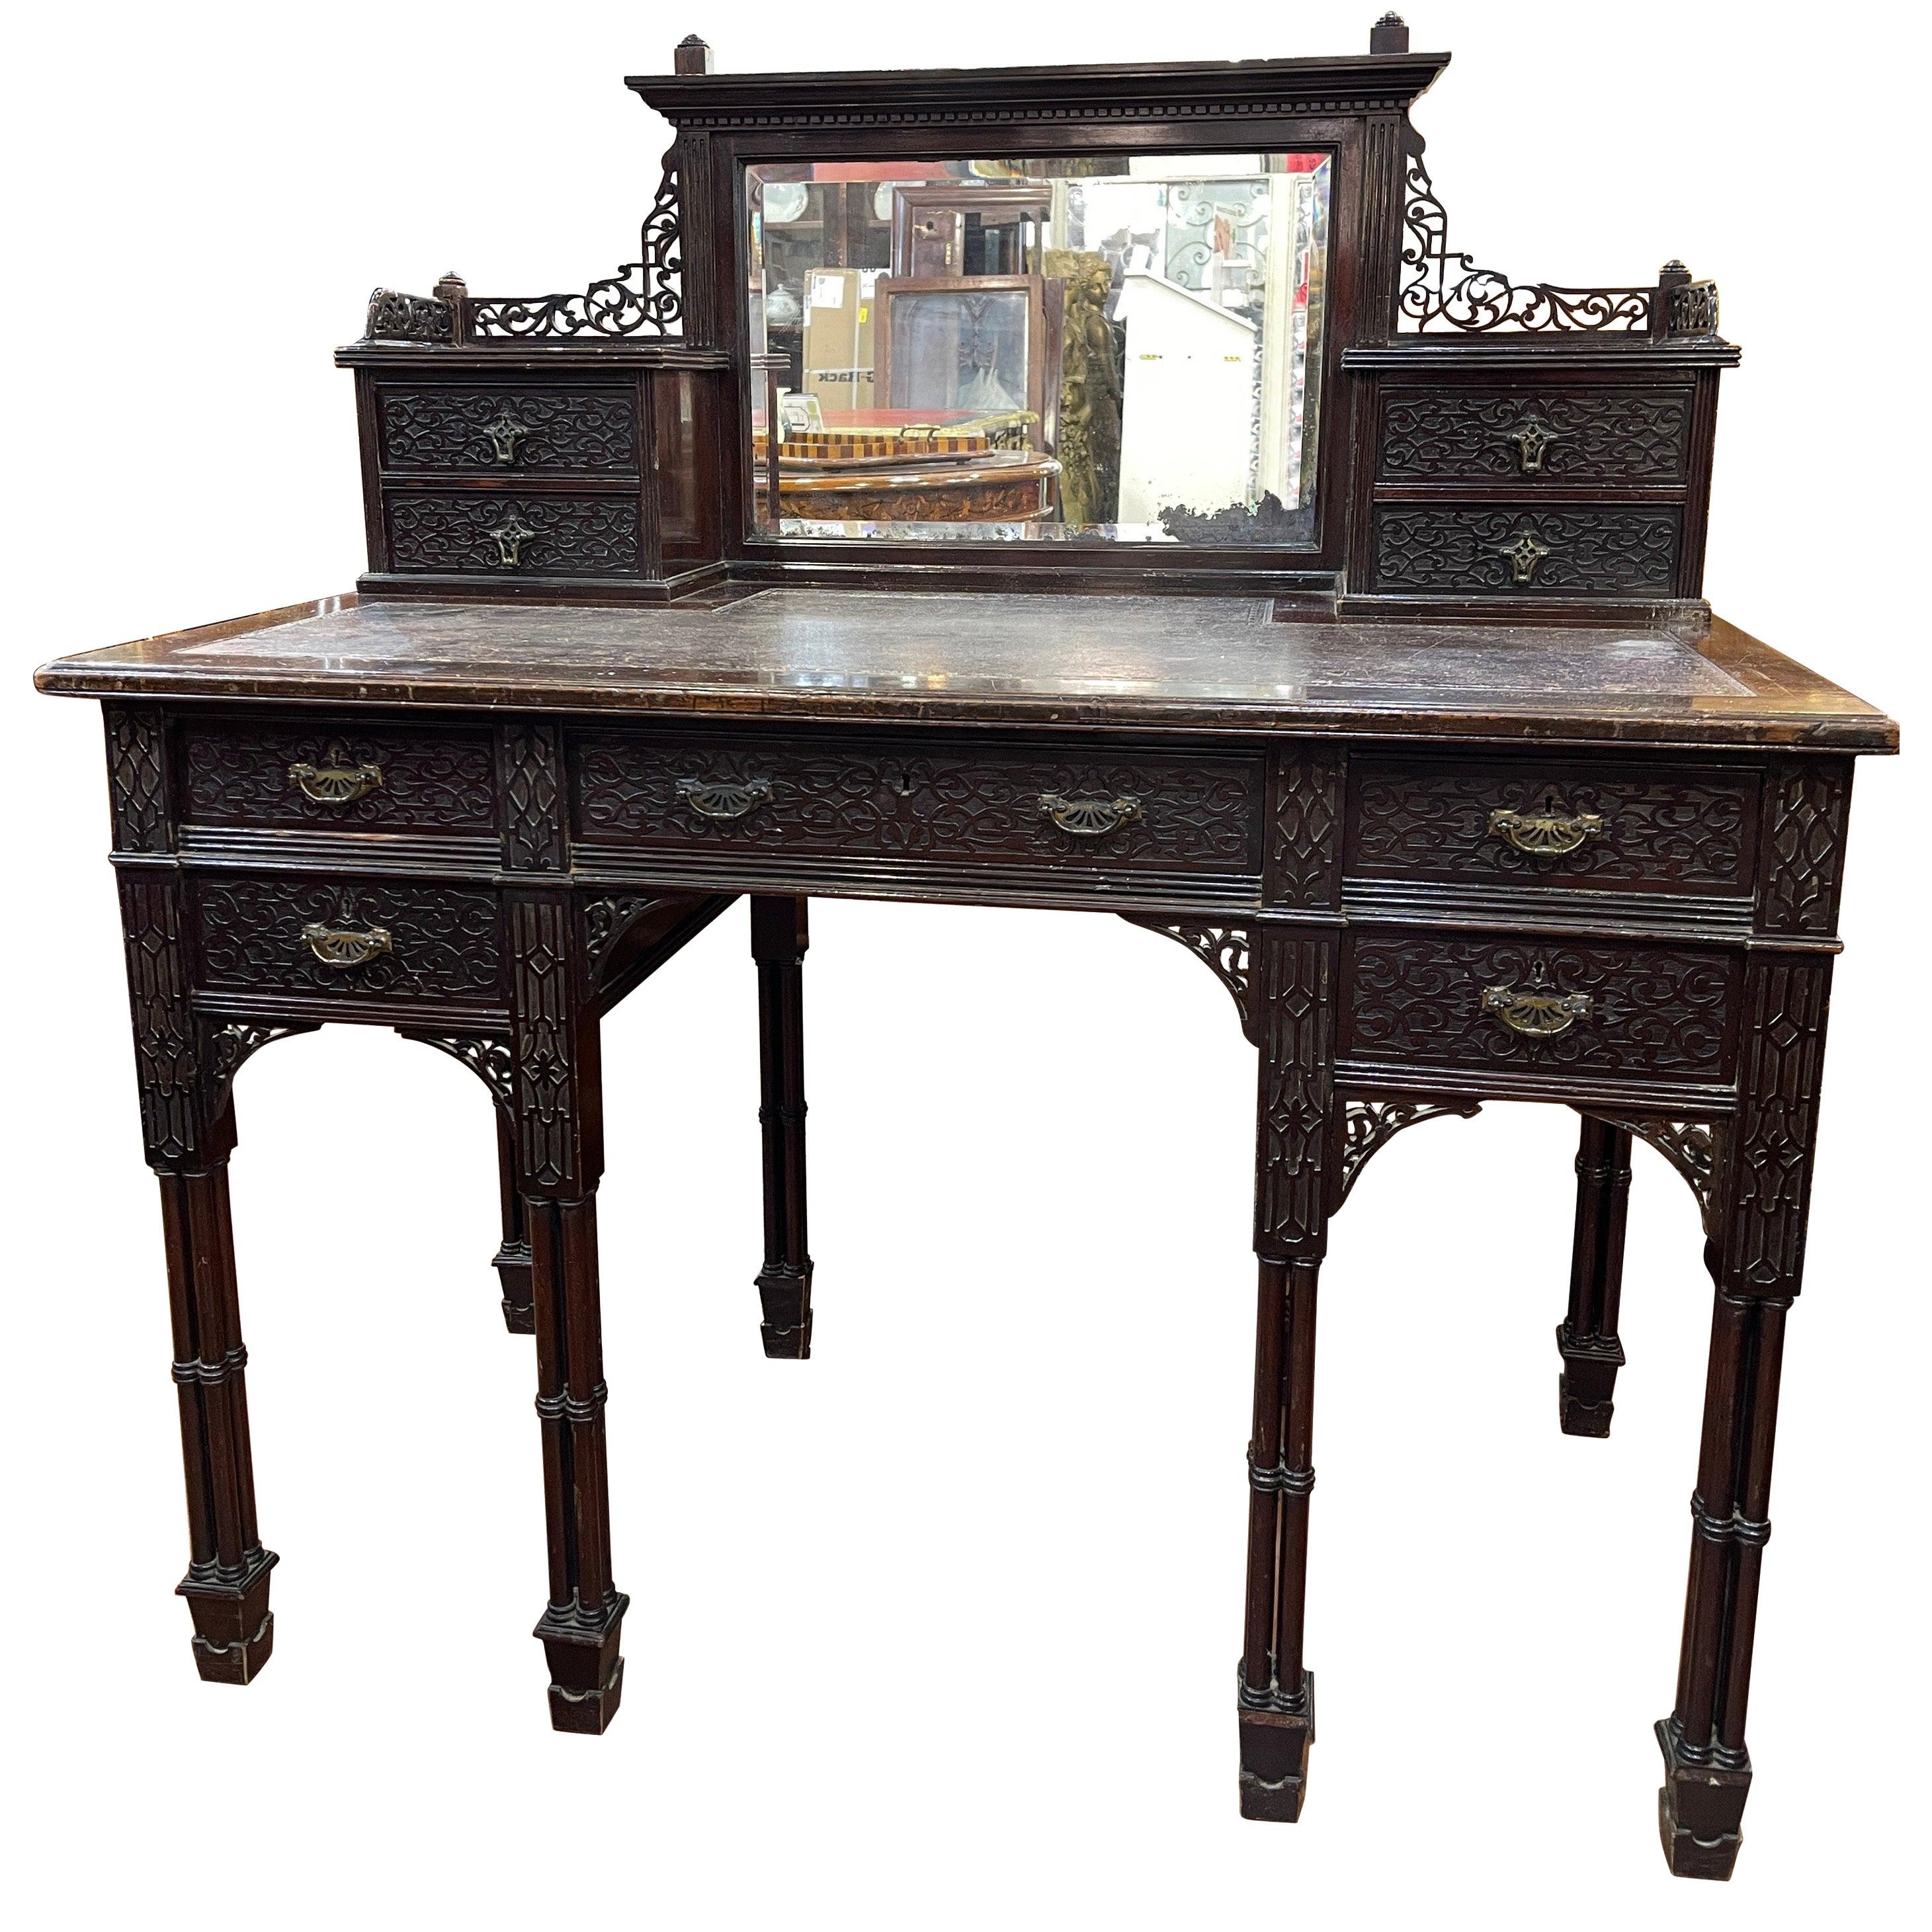 19th Century English Chinoiserie Victorian Mahogany Desk Edwards & Roberts, 1880